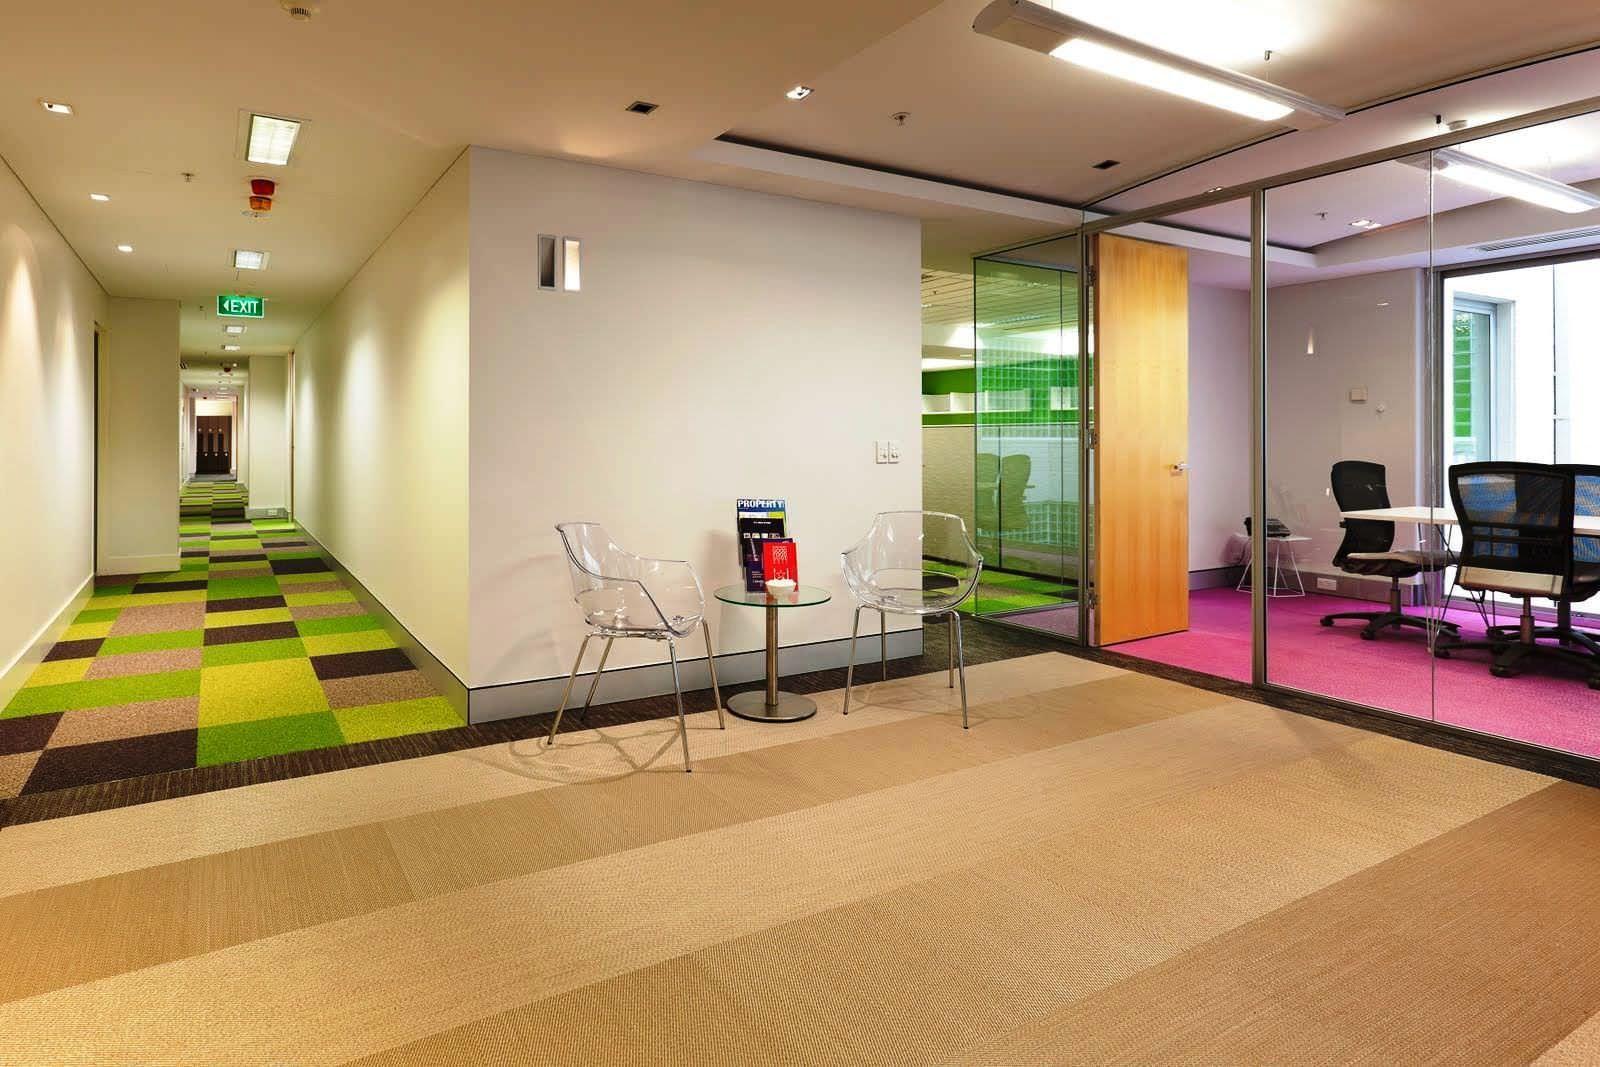 Cheap Carpet for Basement Commercial carpet tiles